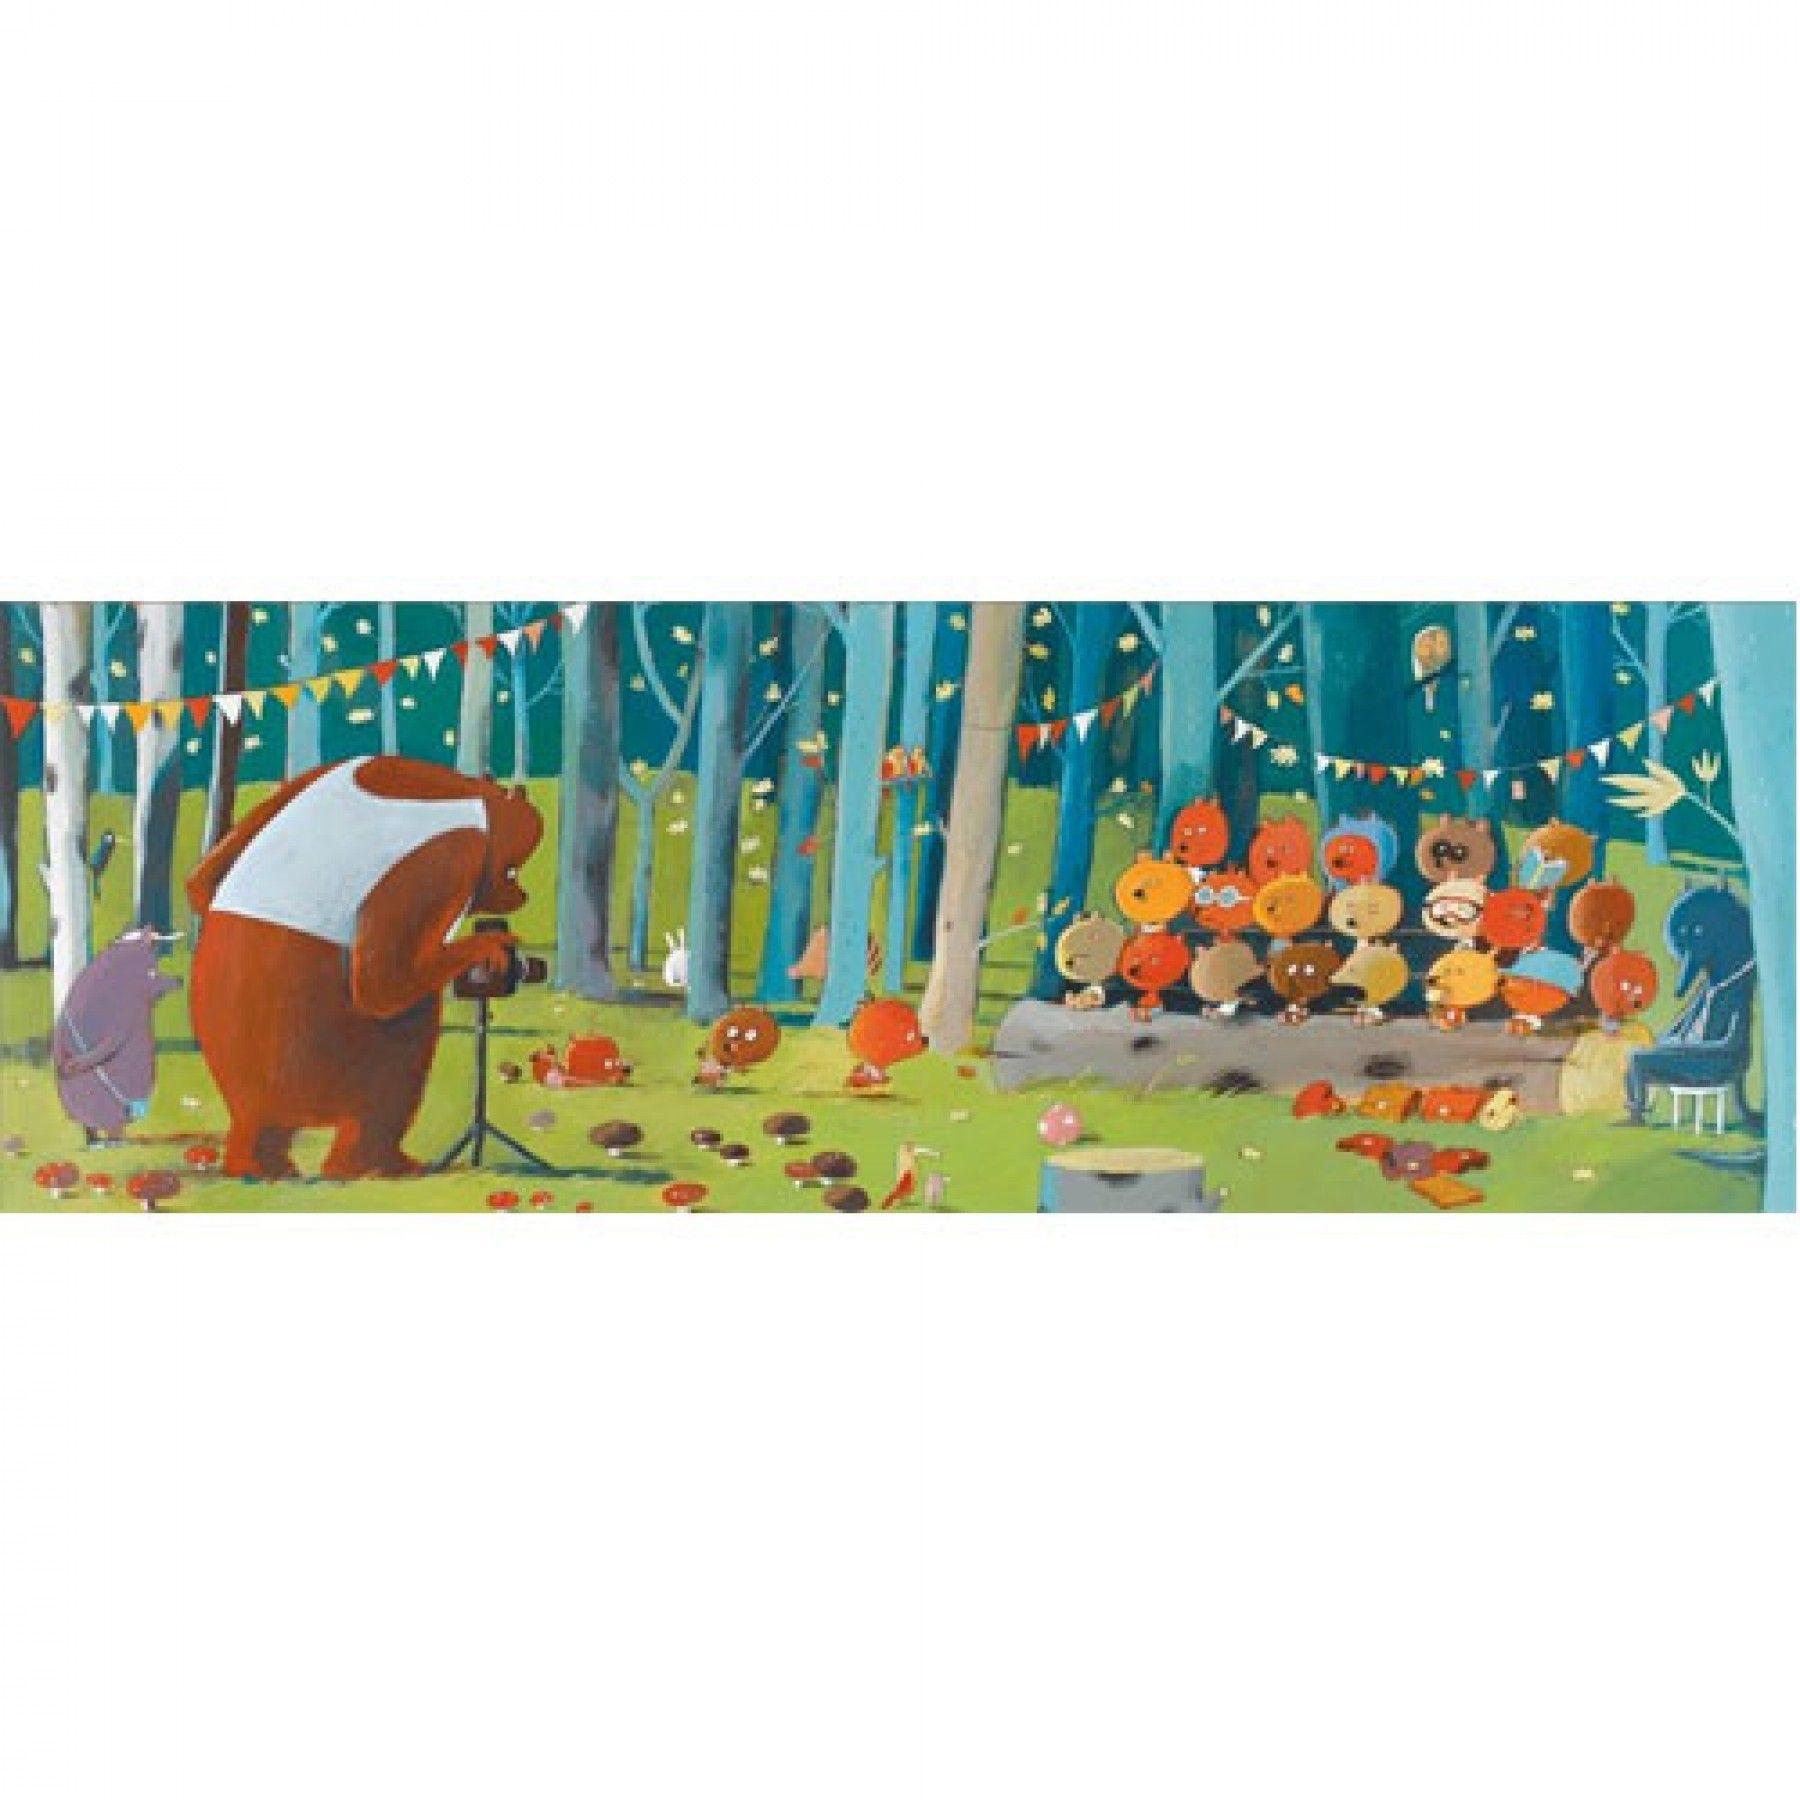 Djeco Djeco Gallerypuzzel - Forest Friends  100pcs 5y+